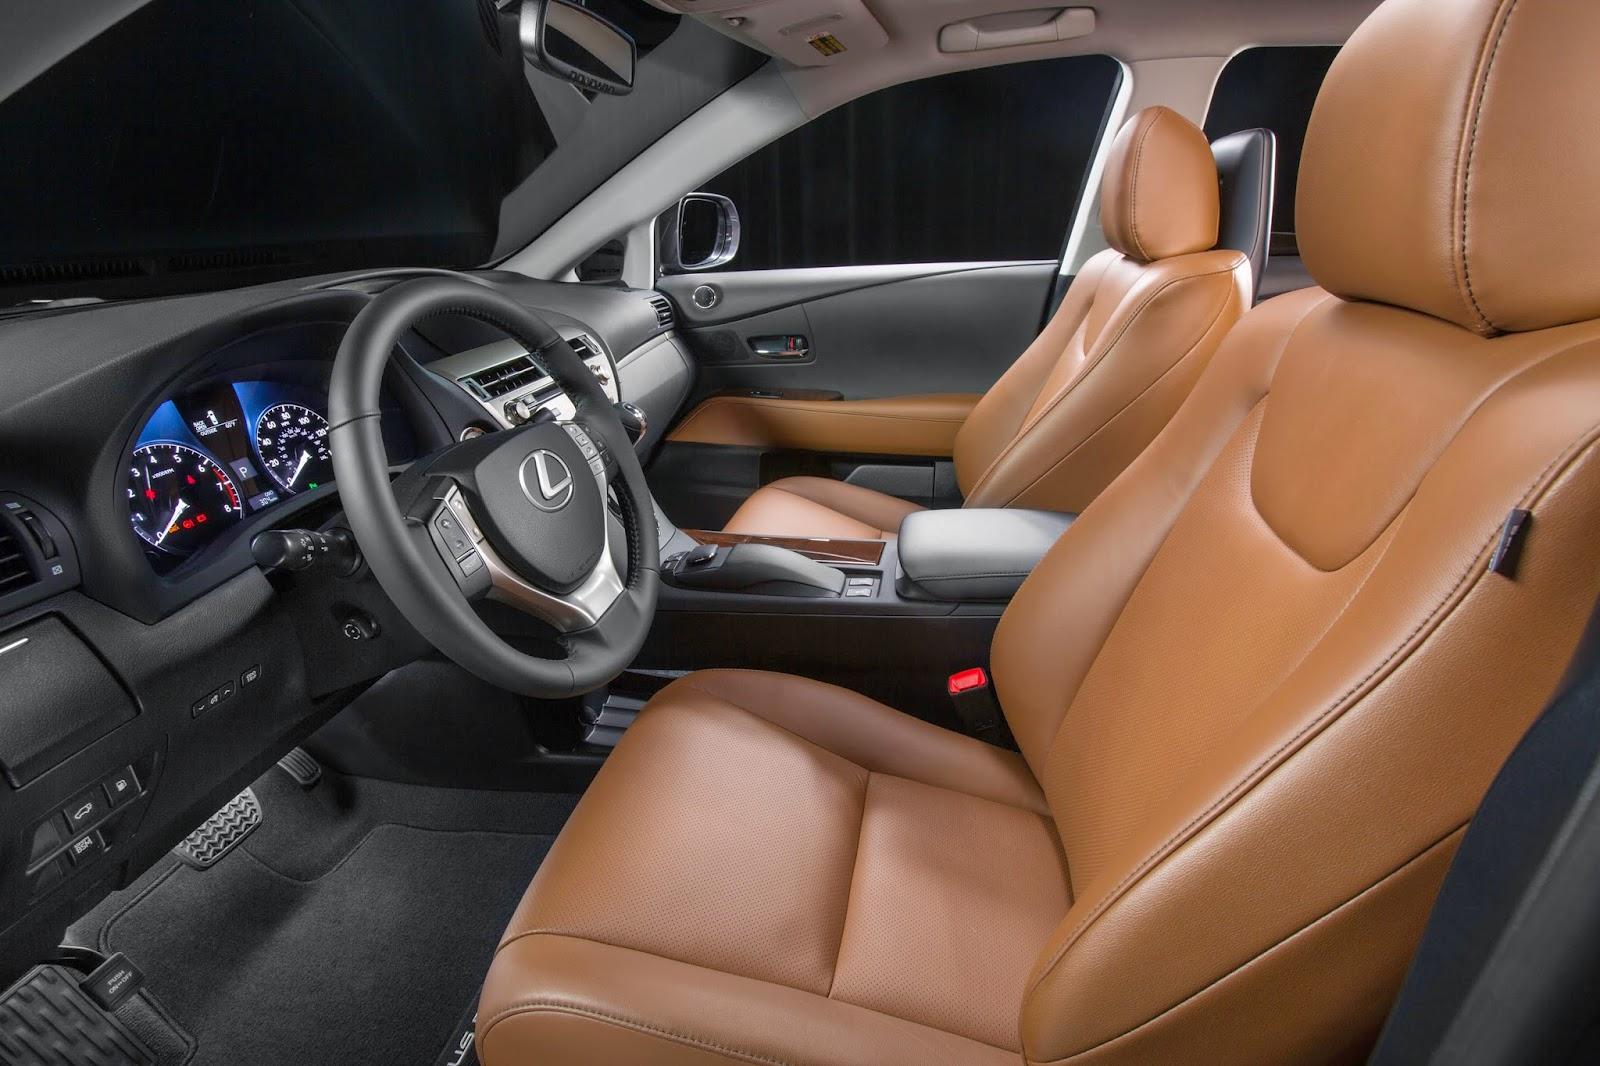 Interior view of 2015 Lexus RX 350